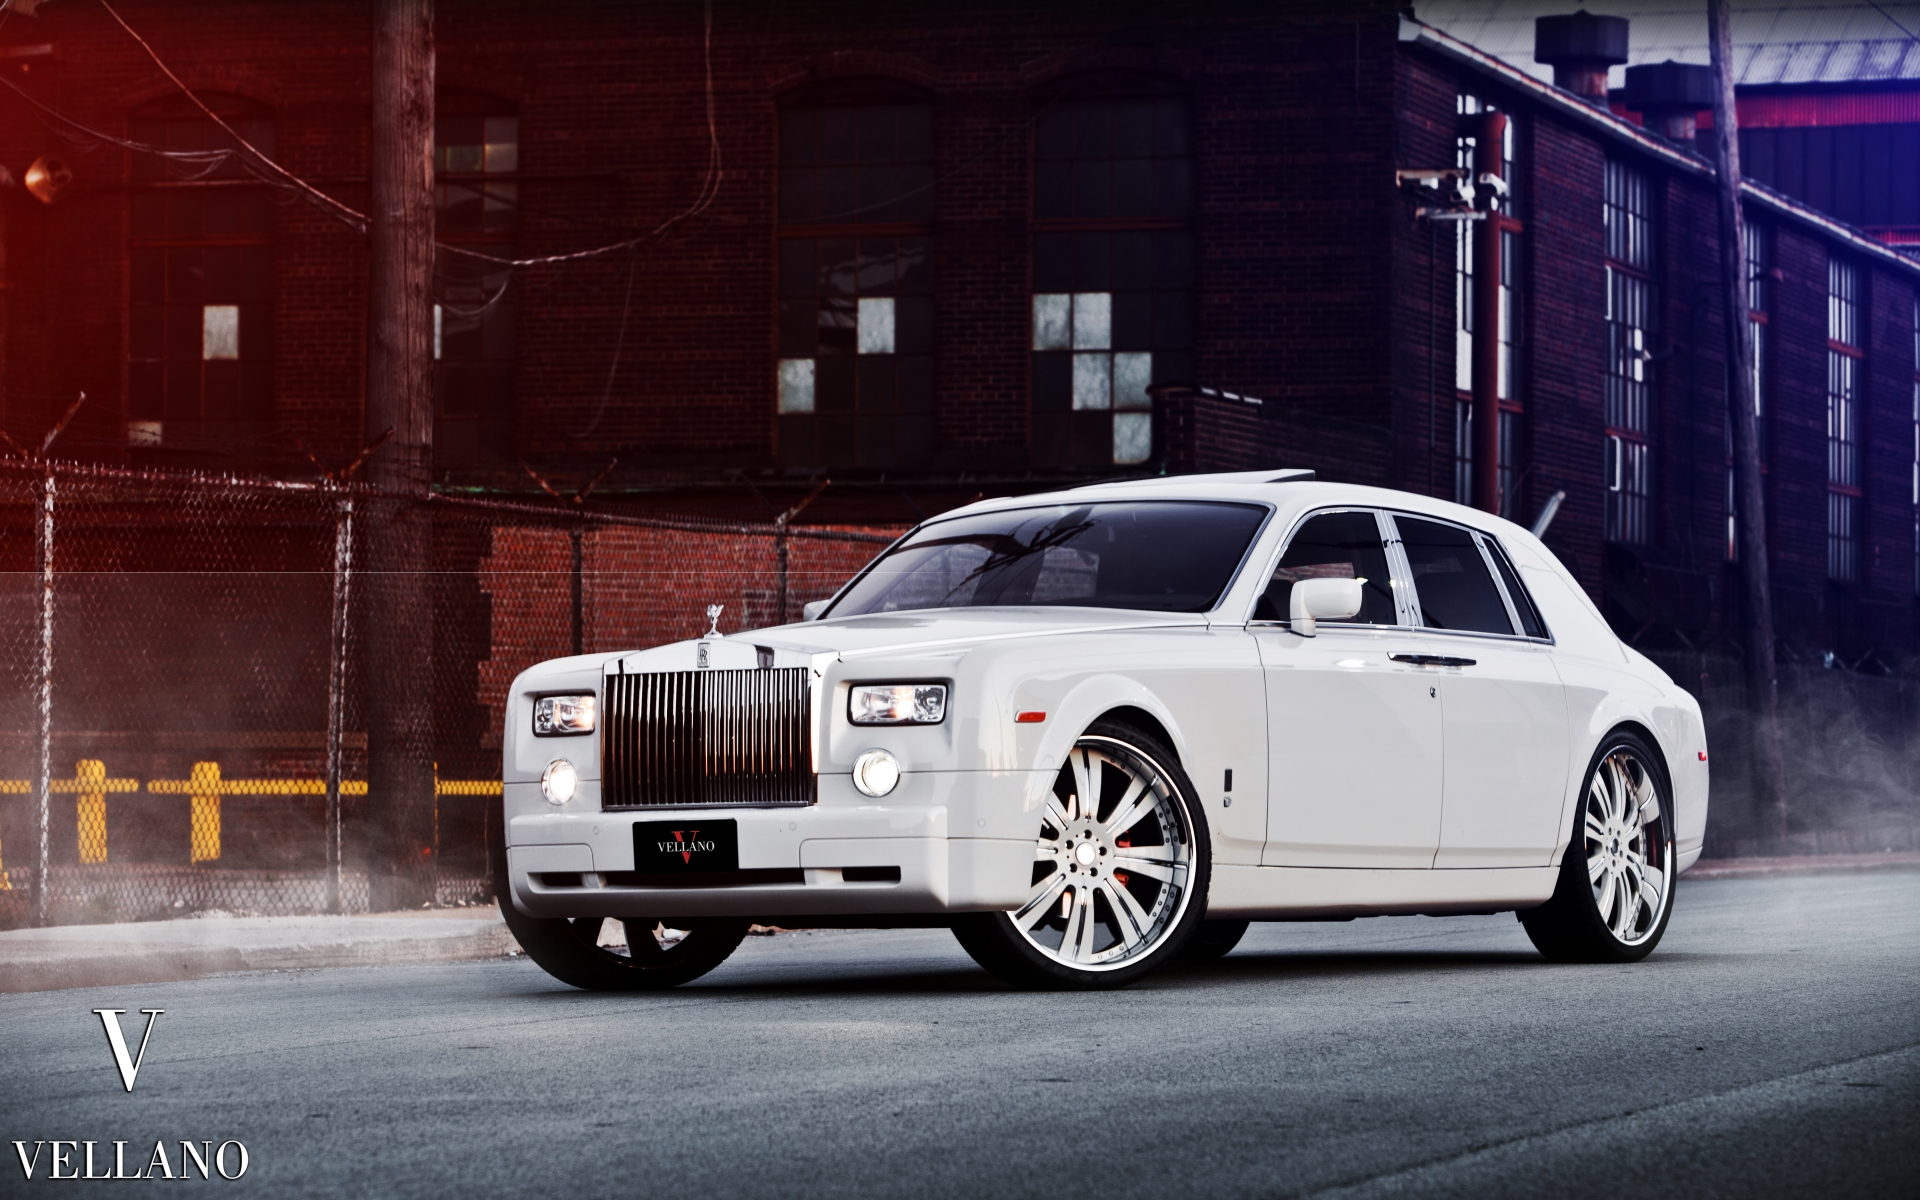 Rolls royce phantom wallpaper wallpapersafari - Rolls royce wallpaper download ...